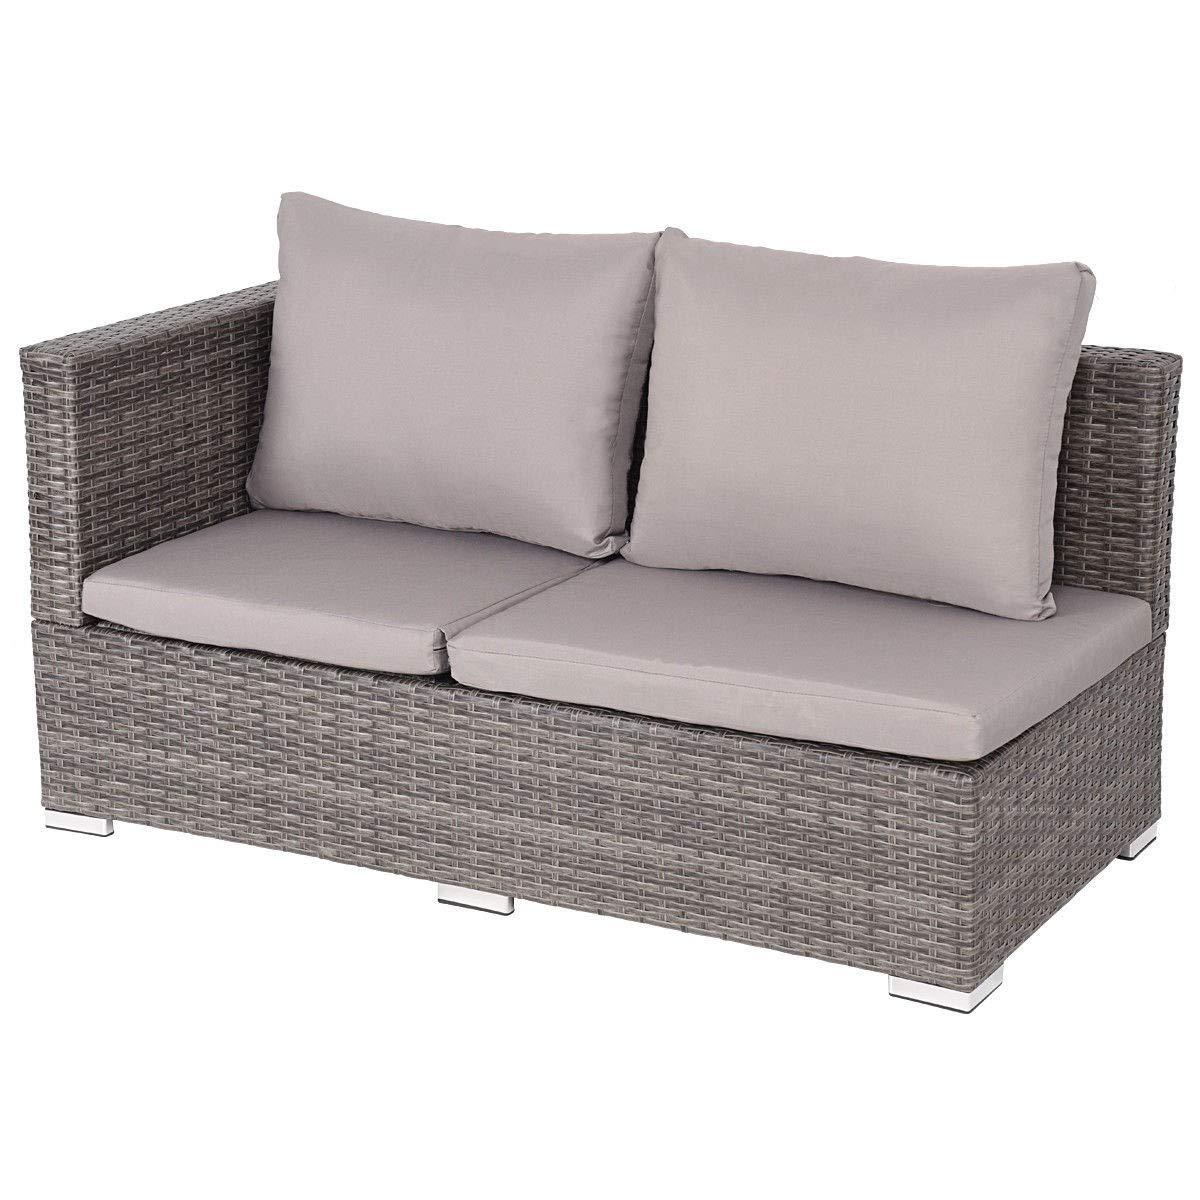 Amazon.com : LeZhel Shop 3 pcs Steel Frame Adjustable Seat ...